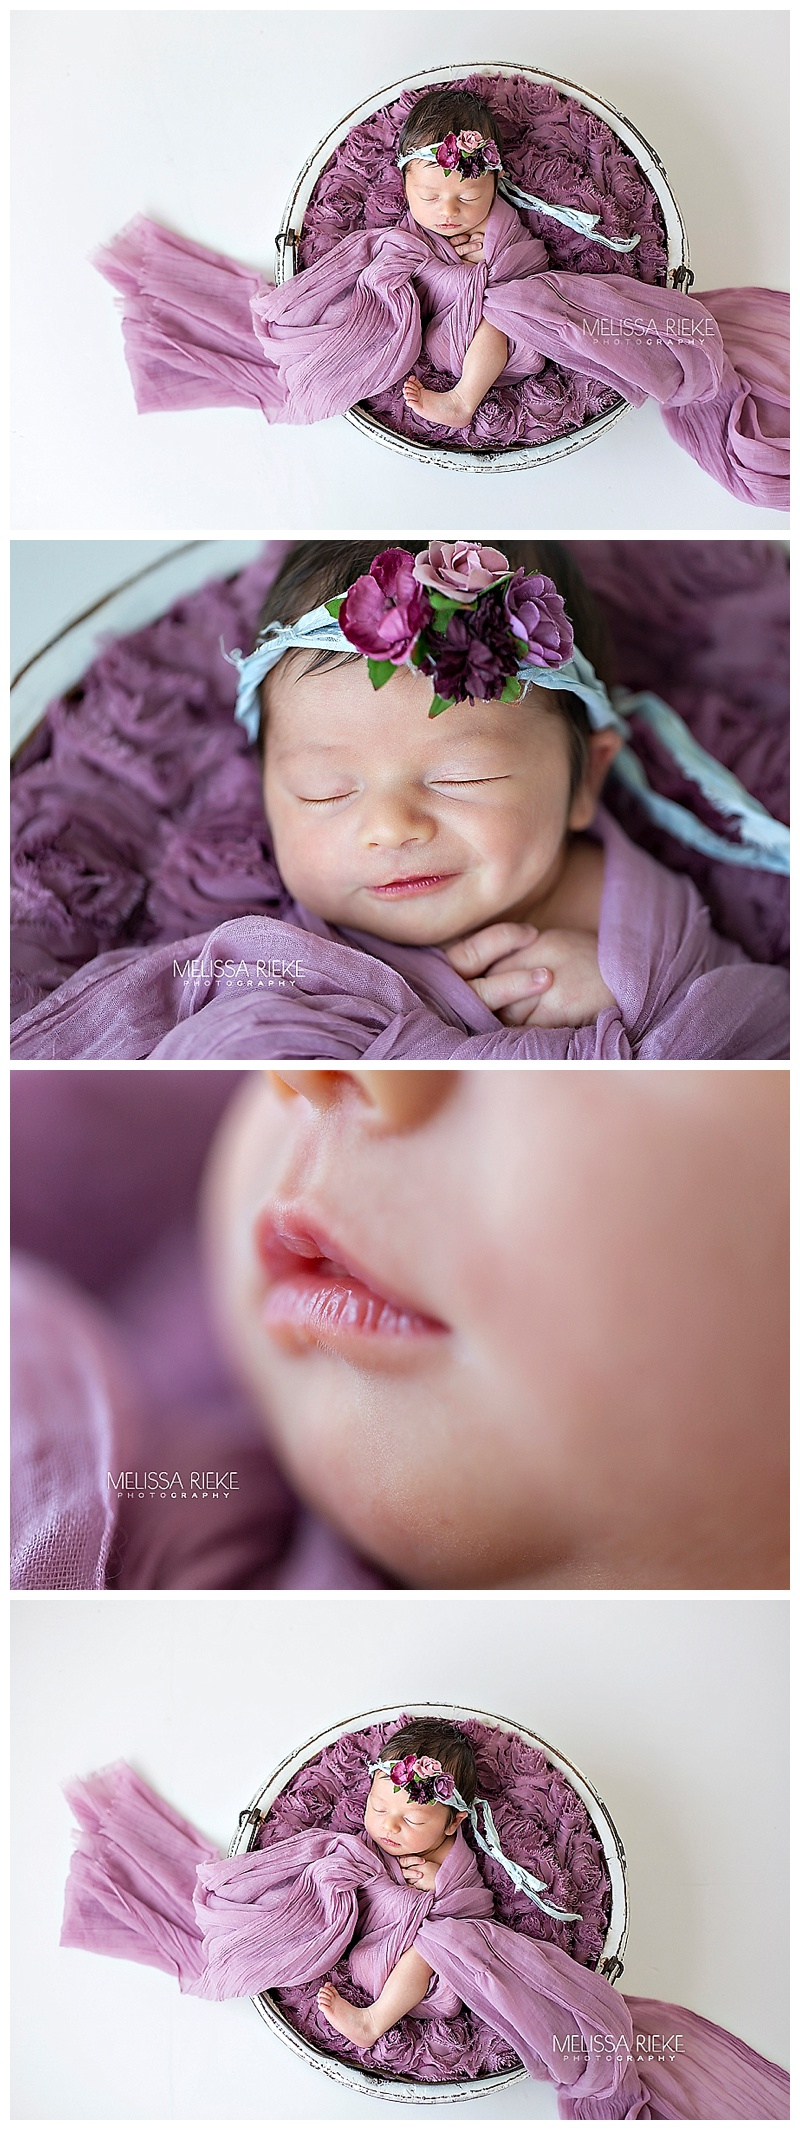 Baby Emmy Tolbert Jade Tanner Bachelor Paradise Kansas City Newborn Portraits Pictures